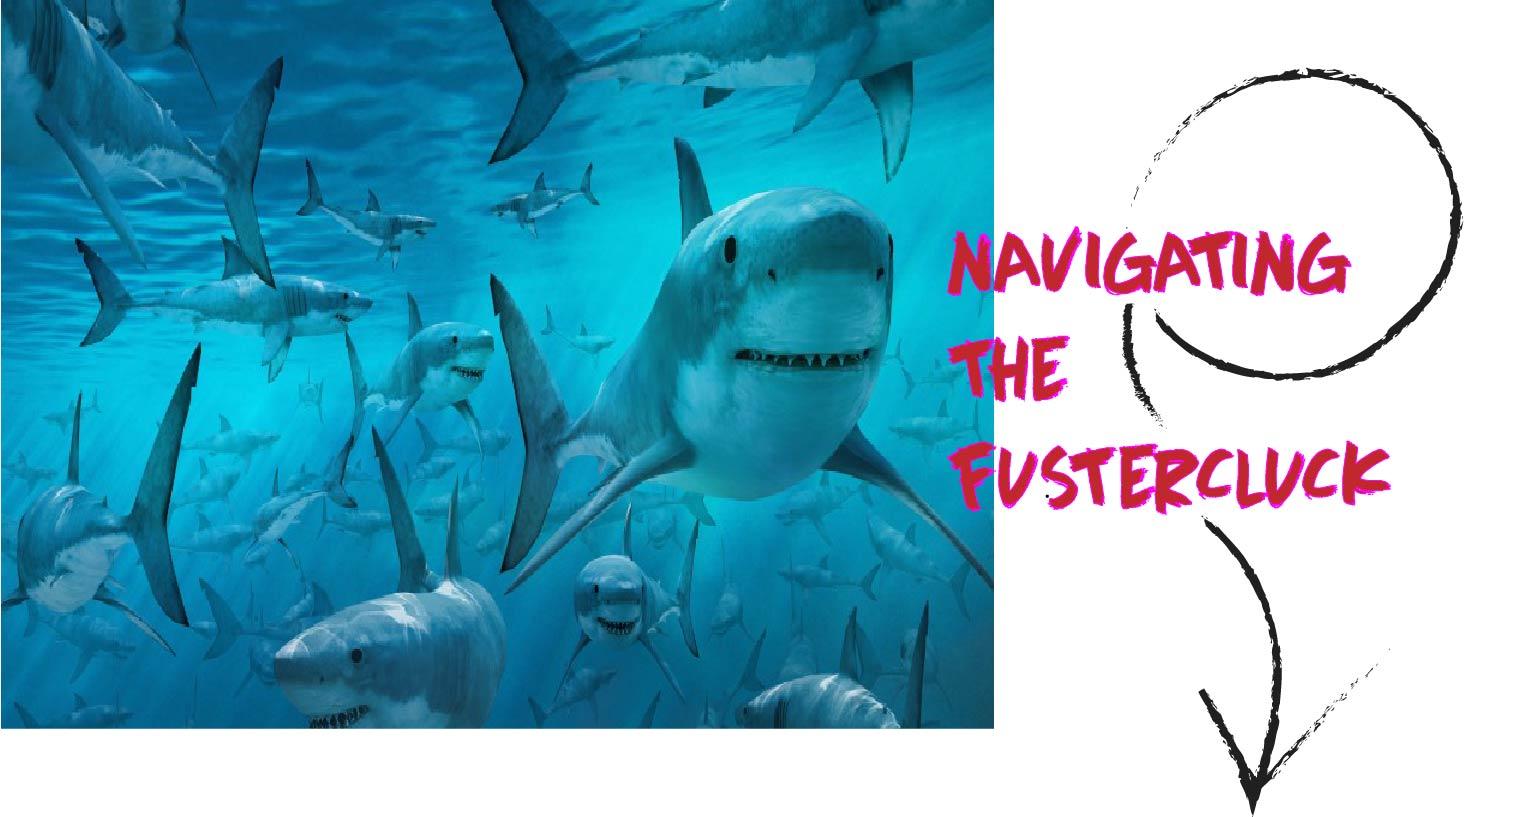 PhotoCredit:  http://2ap93t1x1l6e2f6gfo3ag4vw.wpengine.netdna-cdn.com/wp-content/uploads/2015/01/Shark_Frenzy-1000x480.jpg